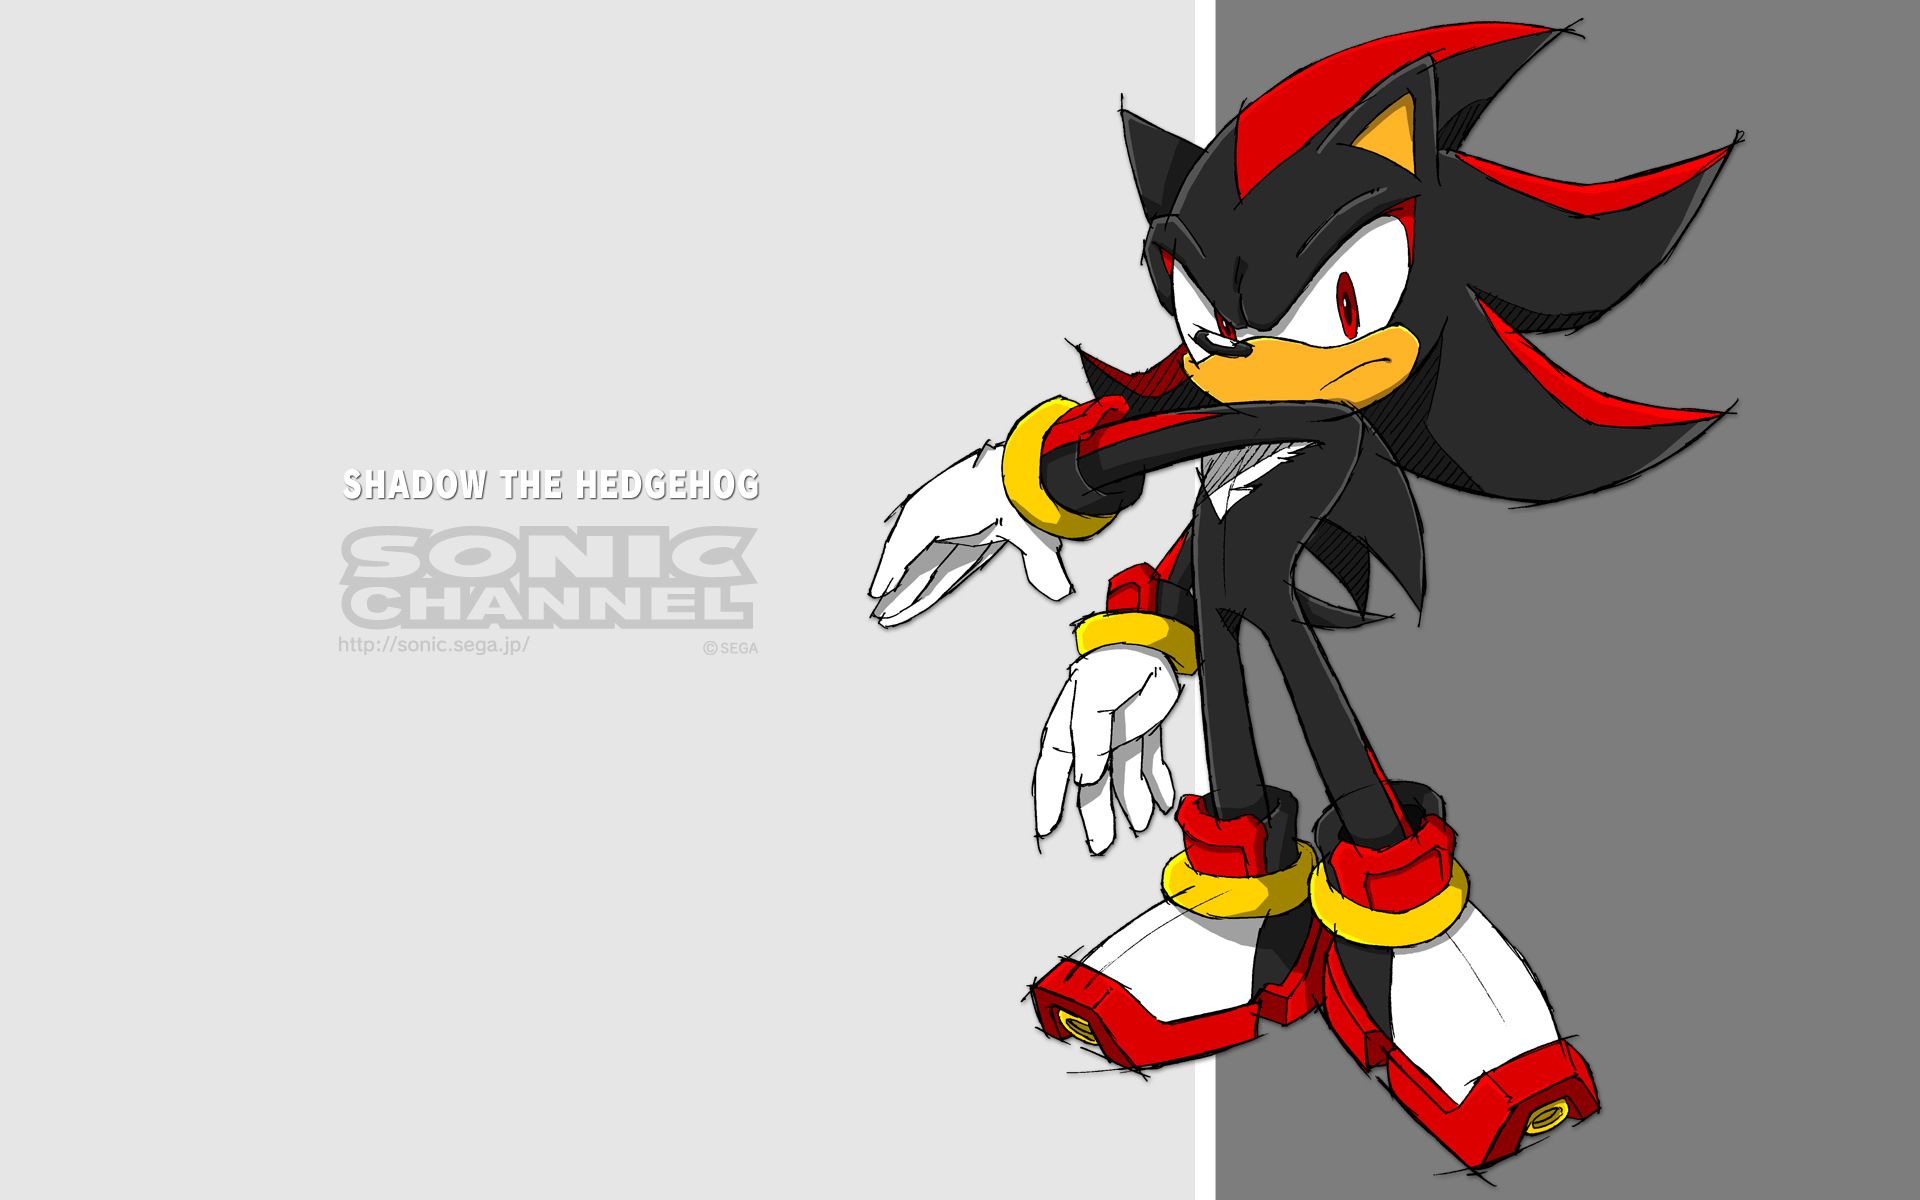 Sonic Channel Wallpaper Sonic Team Sonic The Hedgehog Shadow